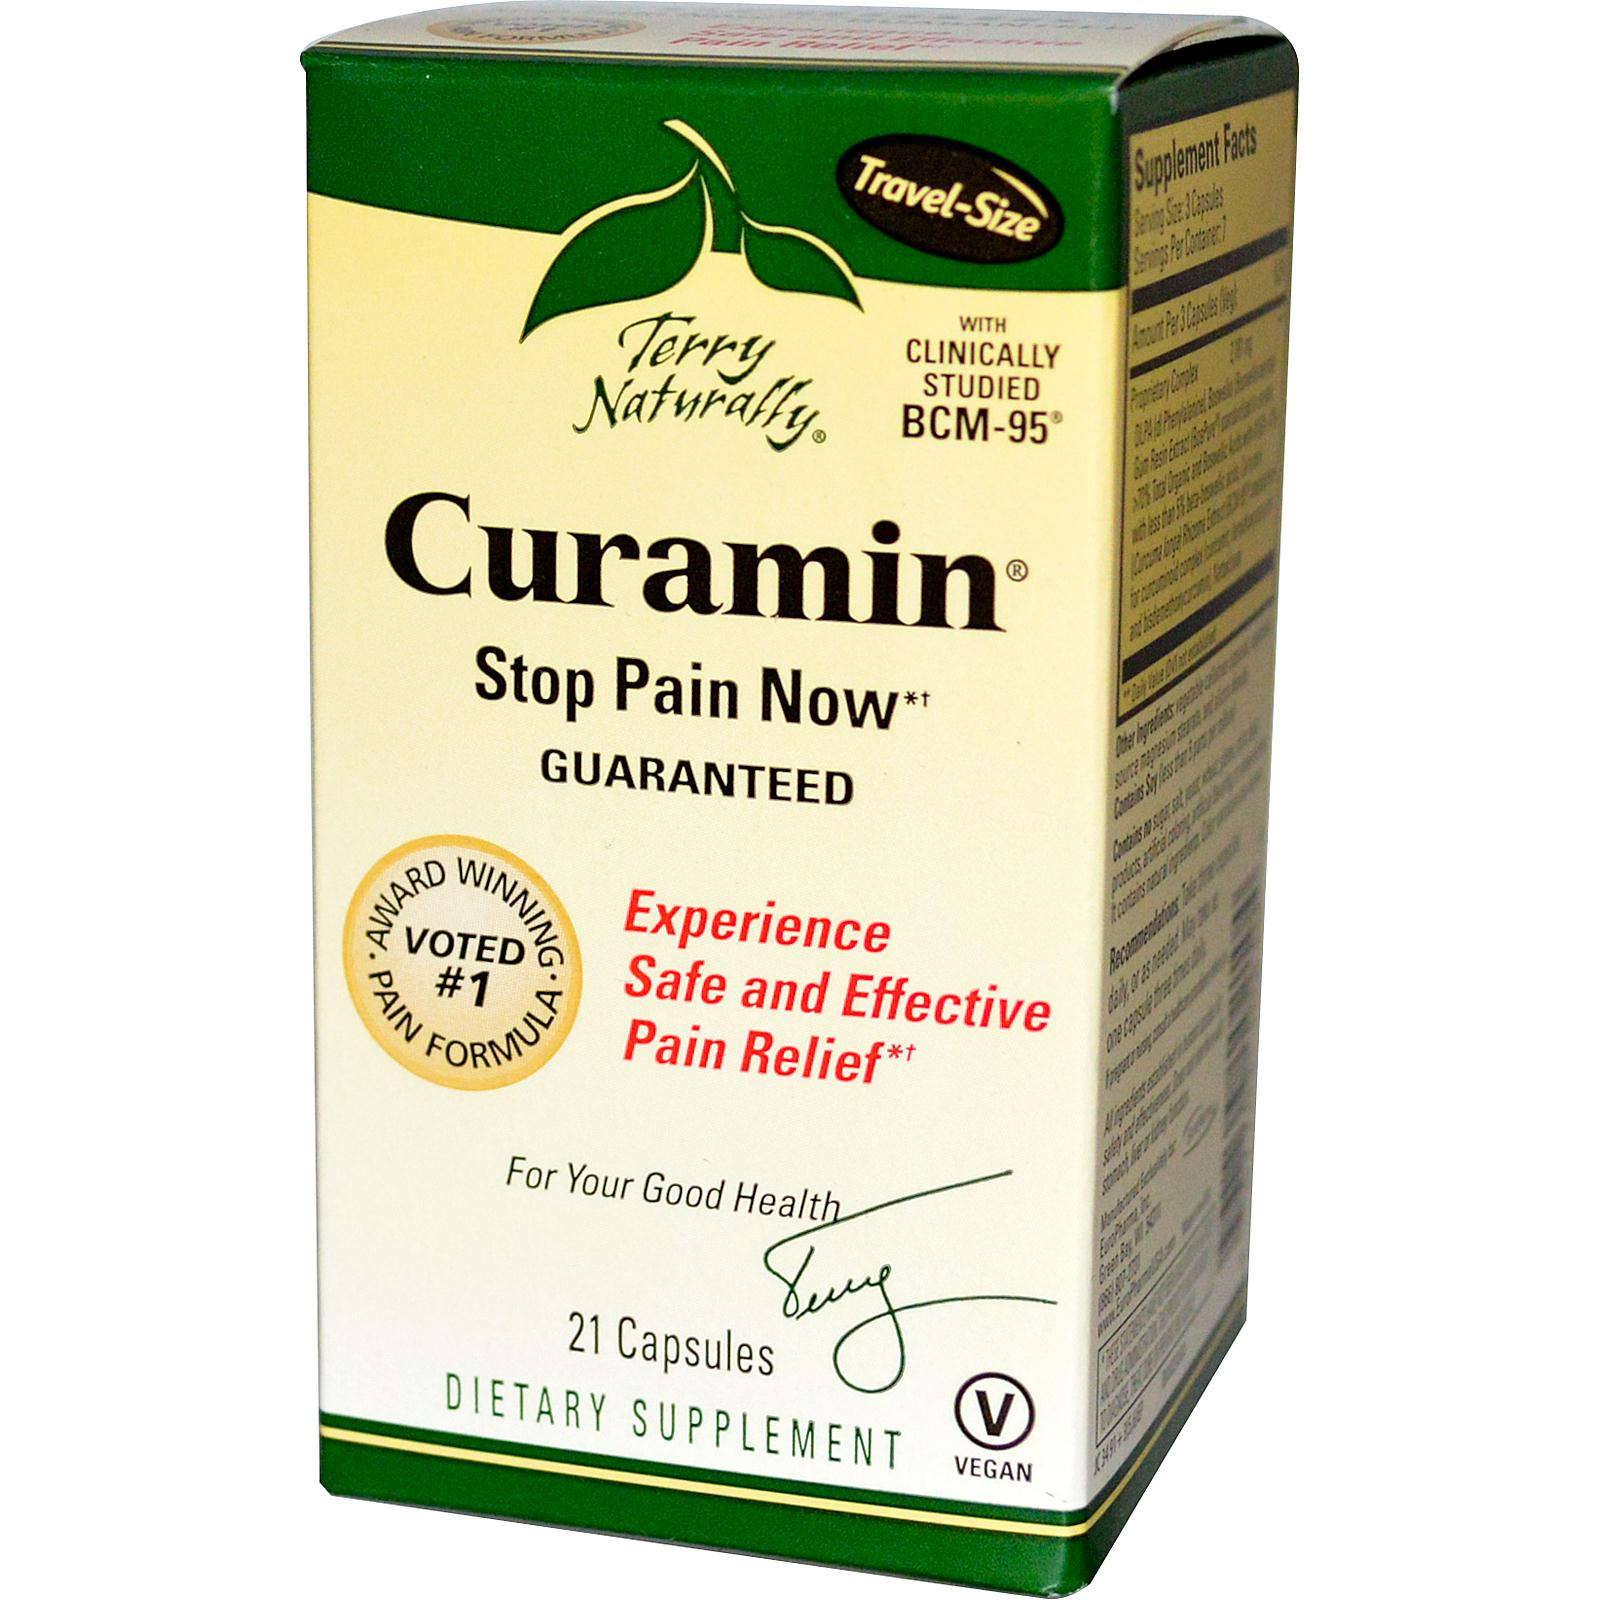 Europharma Curamin Review